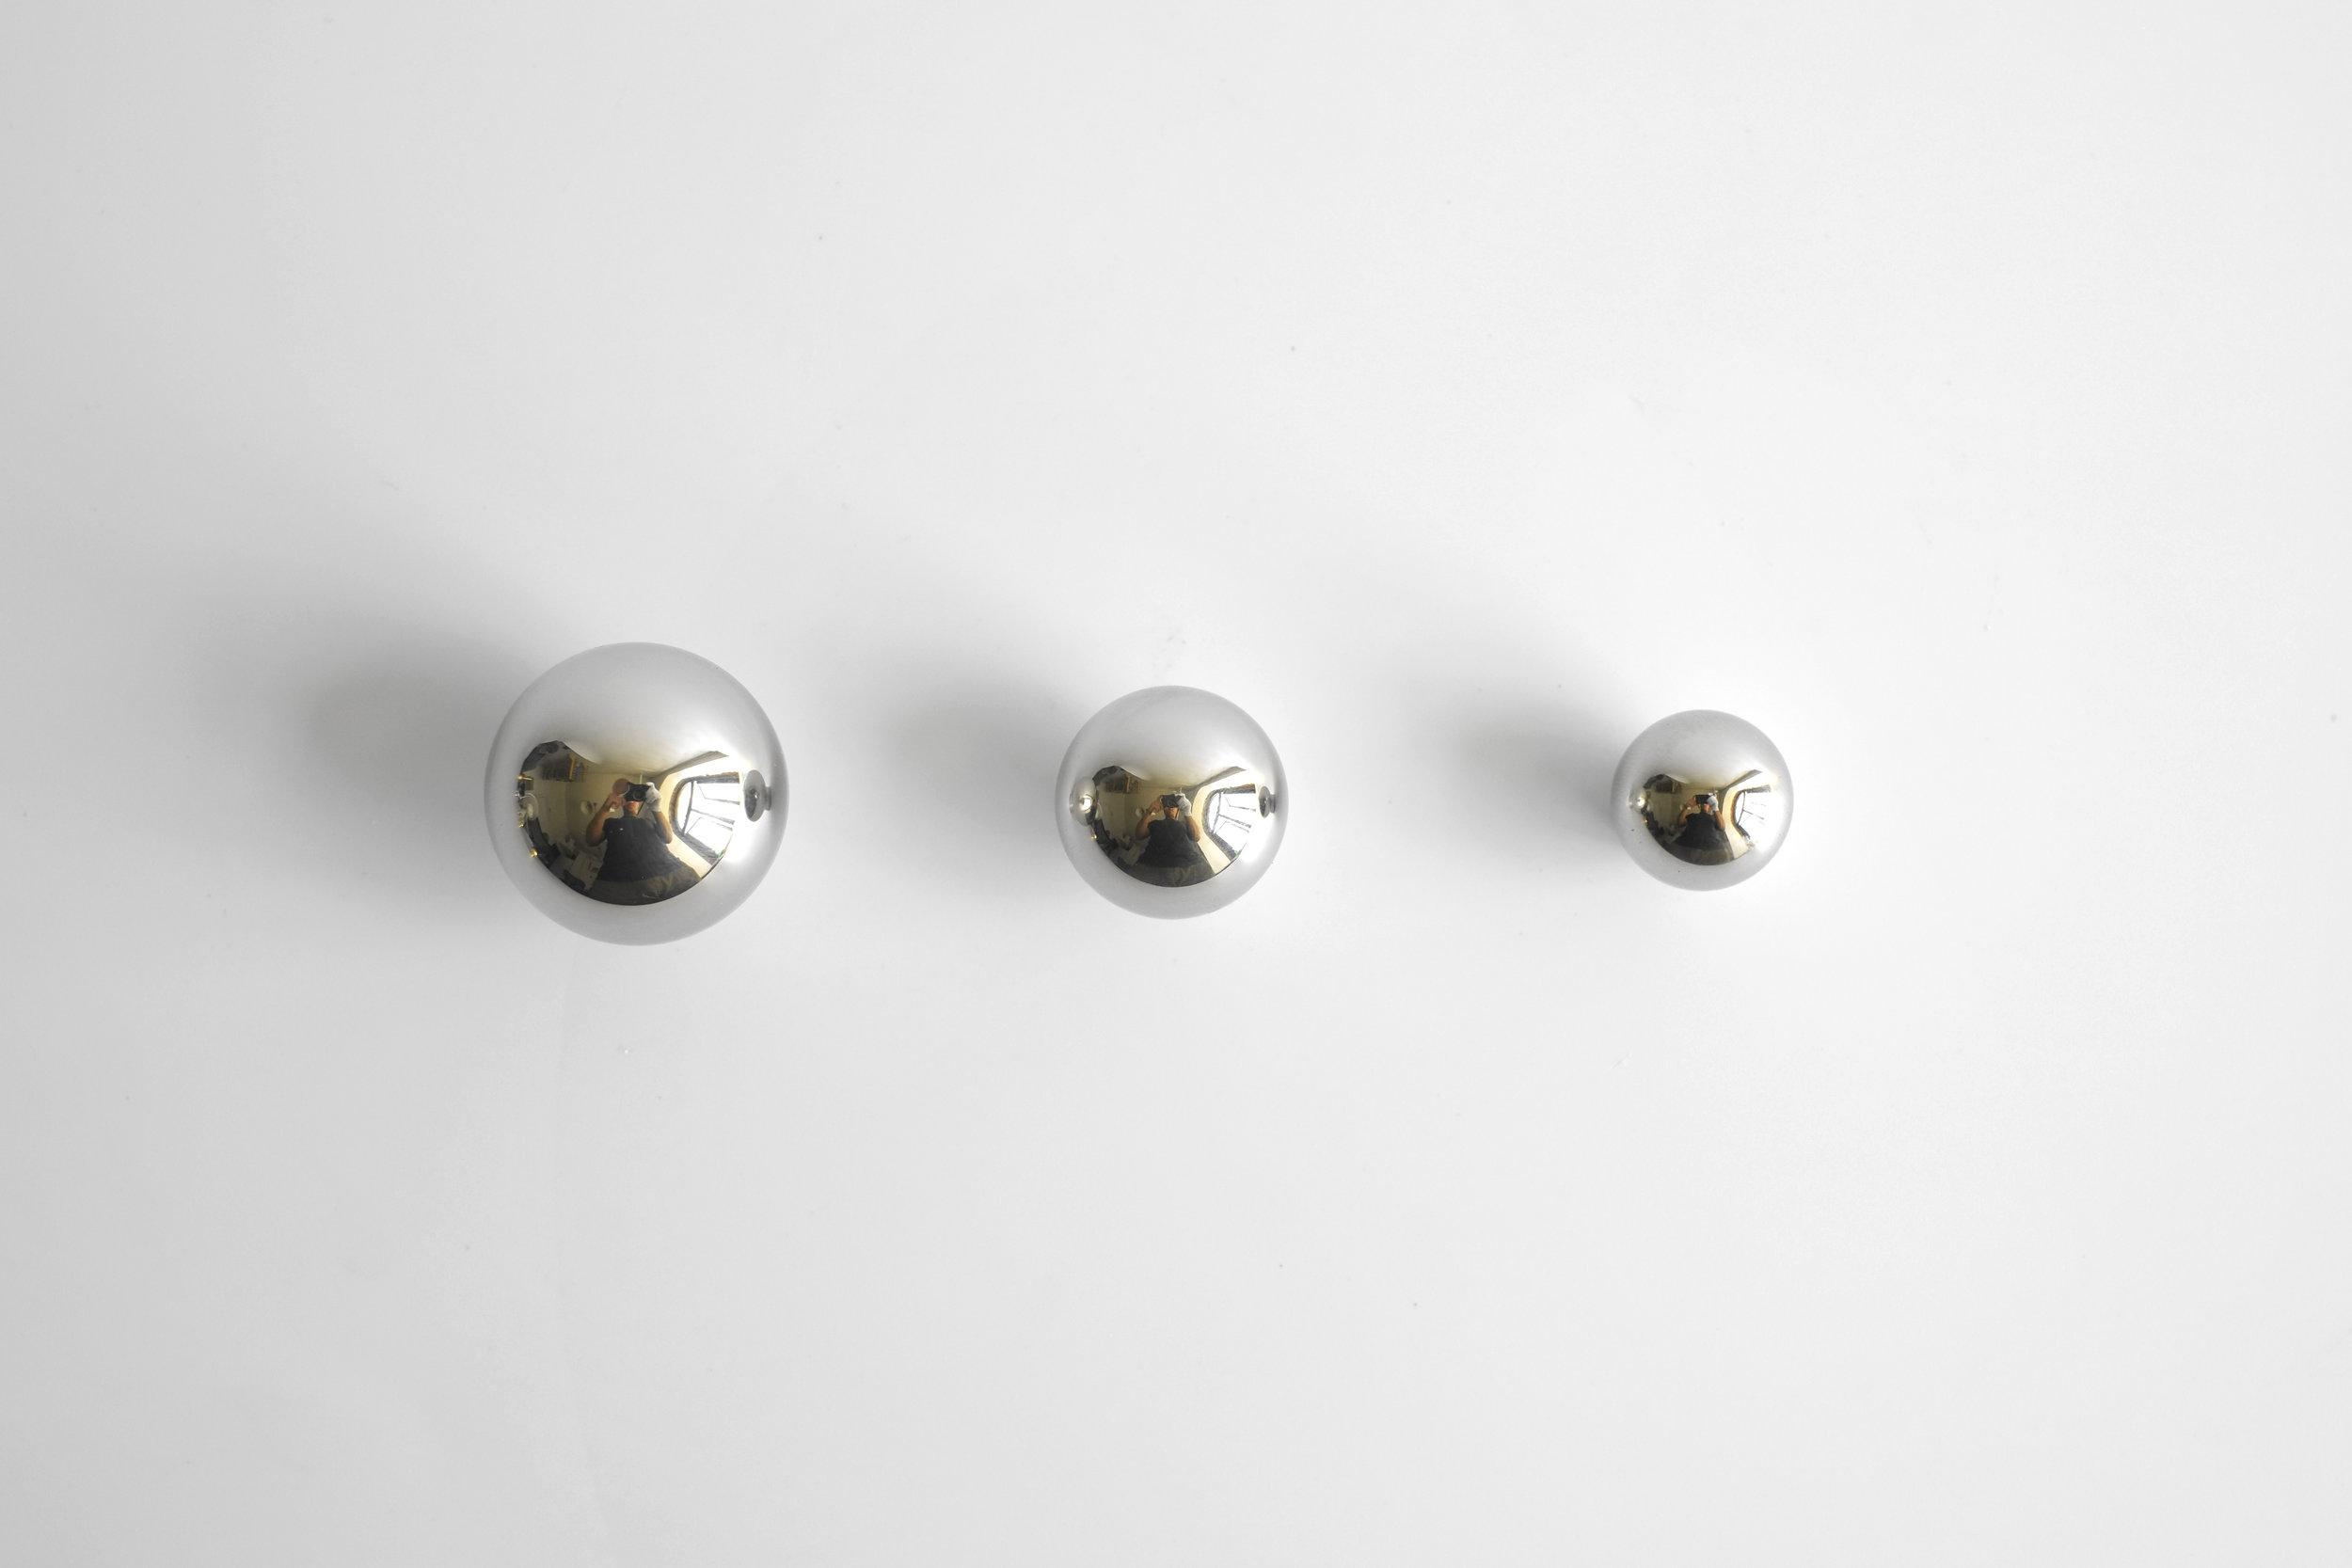 Convex Knob